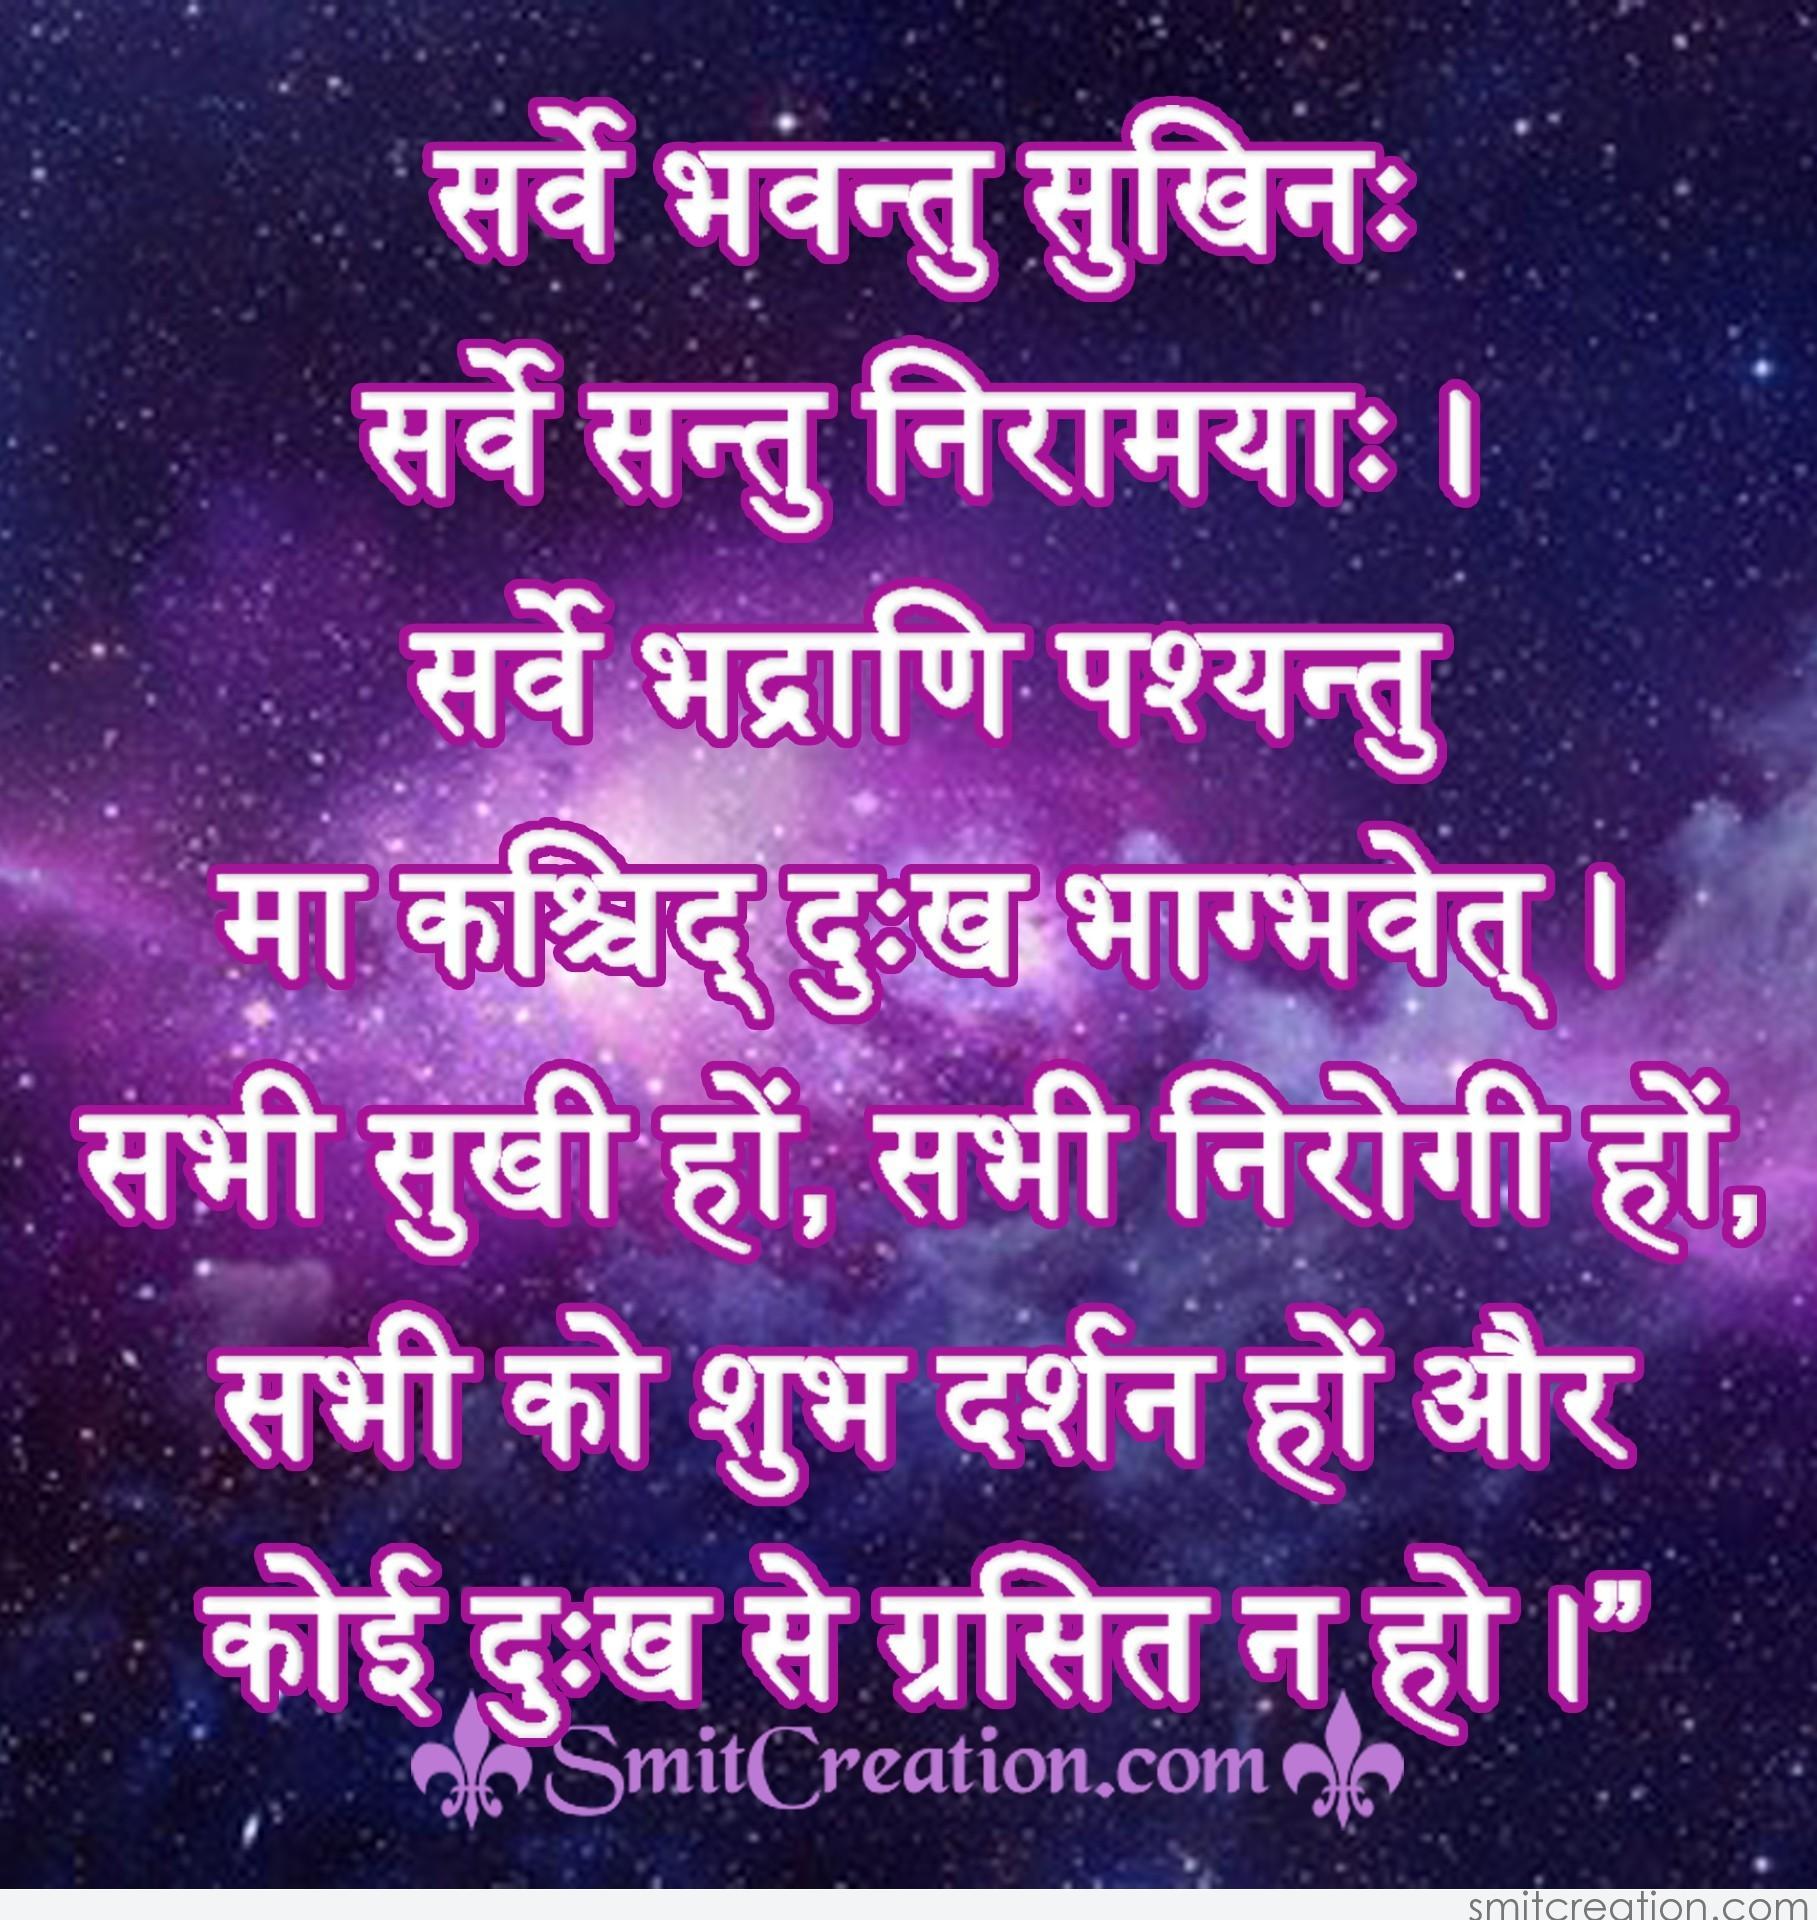 Good Night Wallpapers With Quotes In Hindi Vishwa Prarthana Smitcreation Com